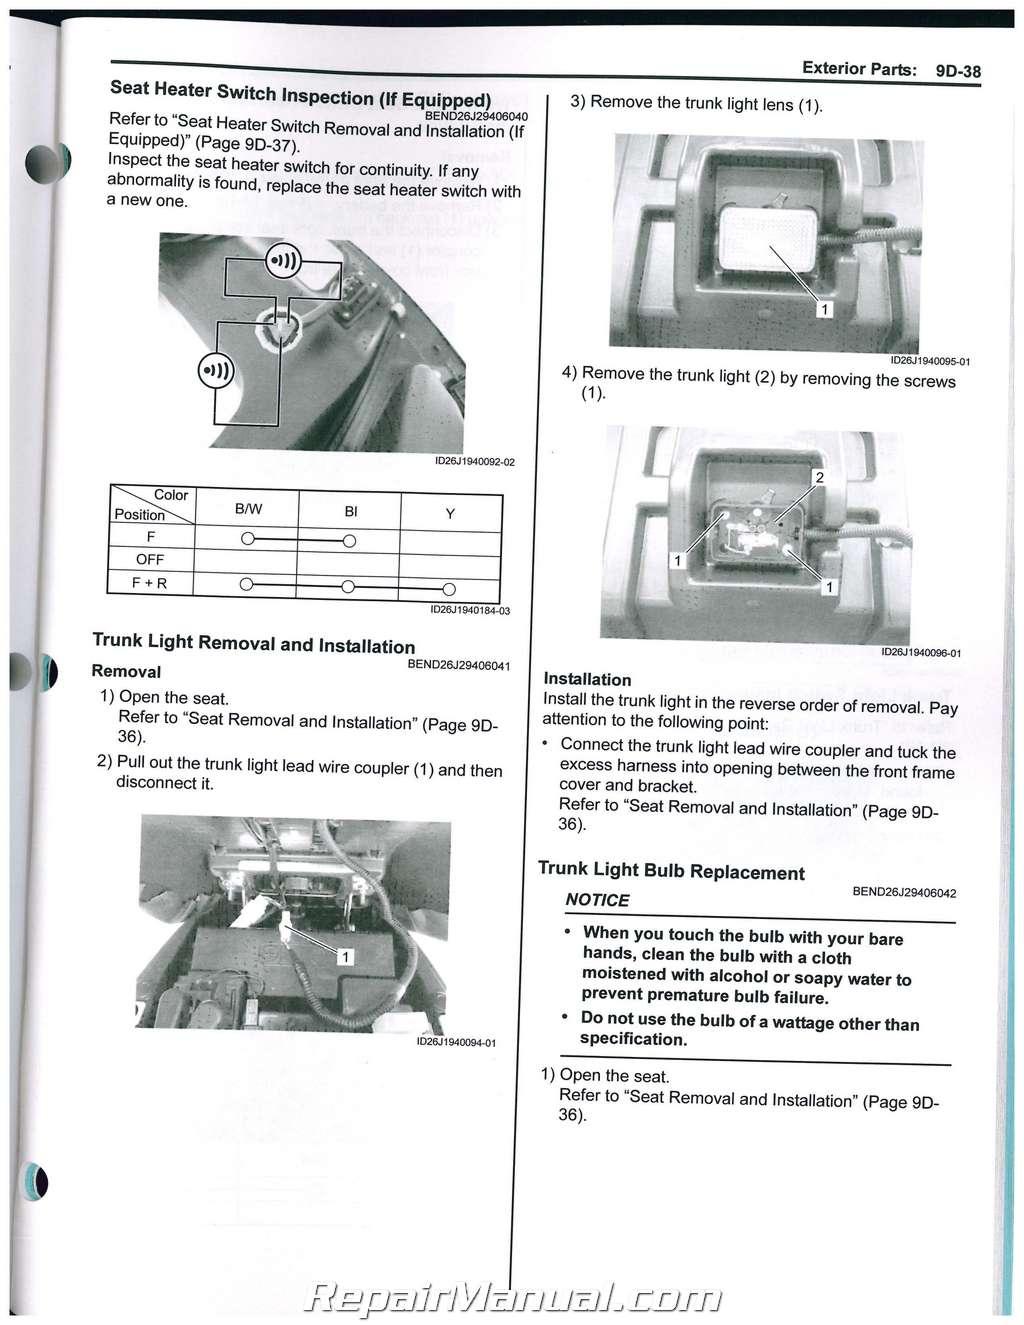 hight resolution of attractive wiring diagram suzuki an650 vignette electrical diagram suzuki burgman 650 owner s manual fantastic wiring diagram